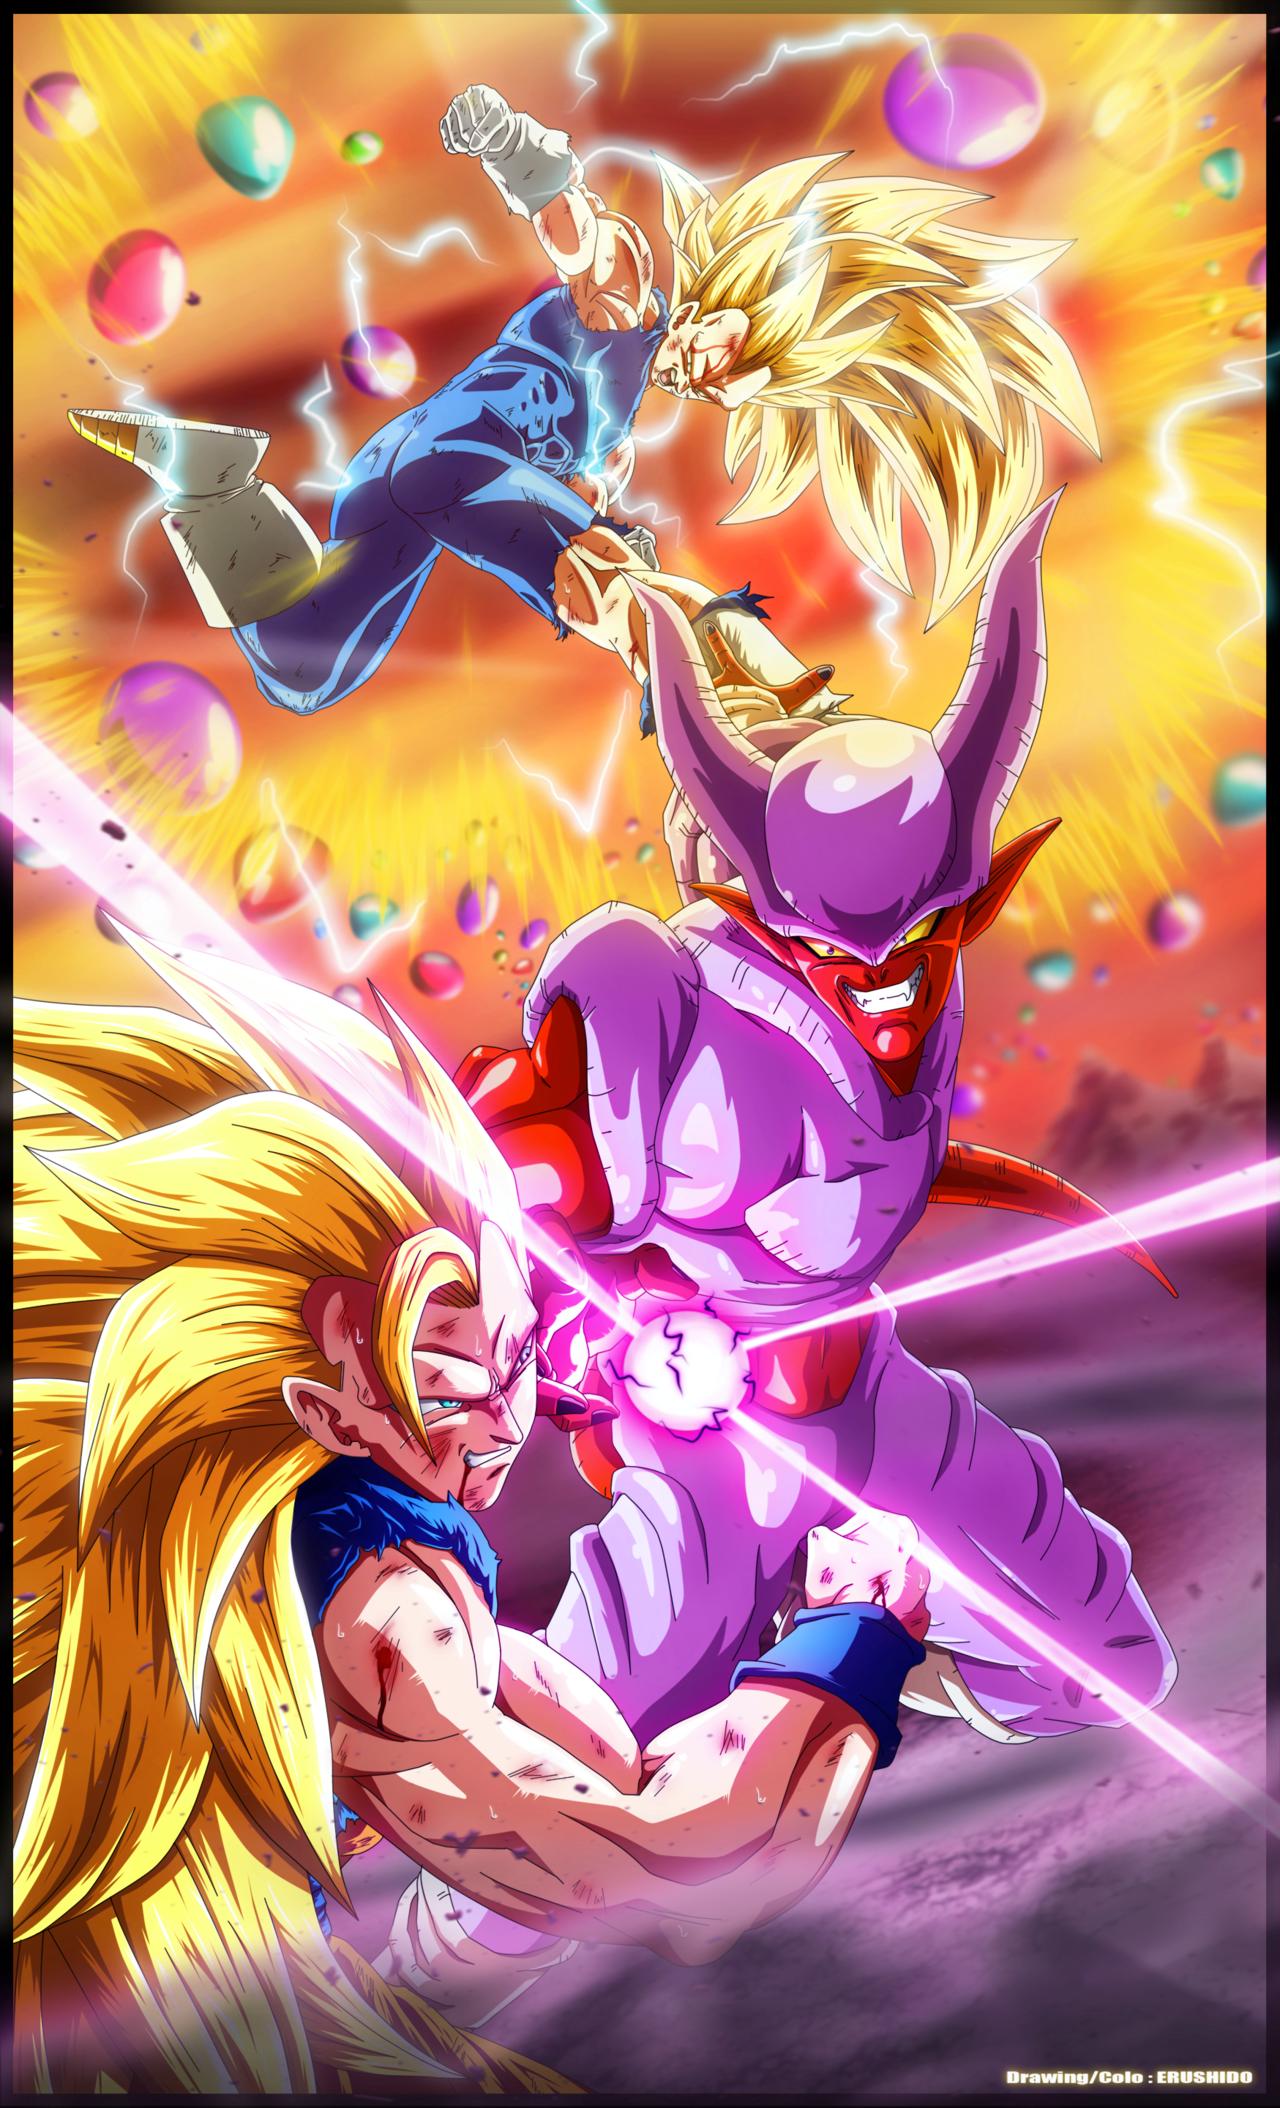 Heroes Evolved Hd Wallpaper Janemba Vs Sayans 3 By Erushido Dragon Ball Dragon